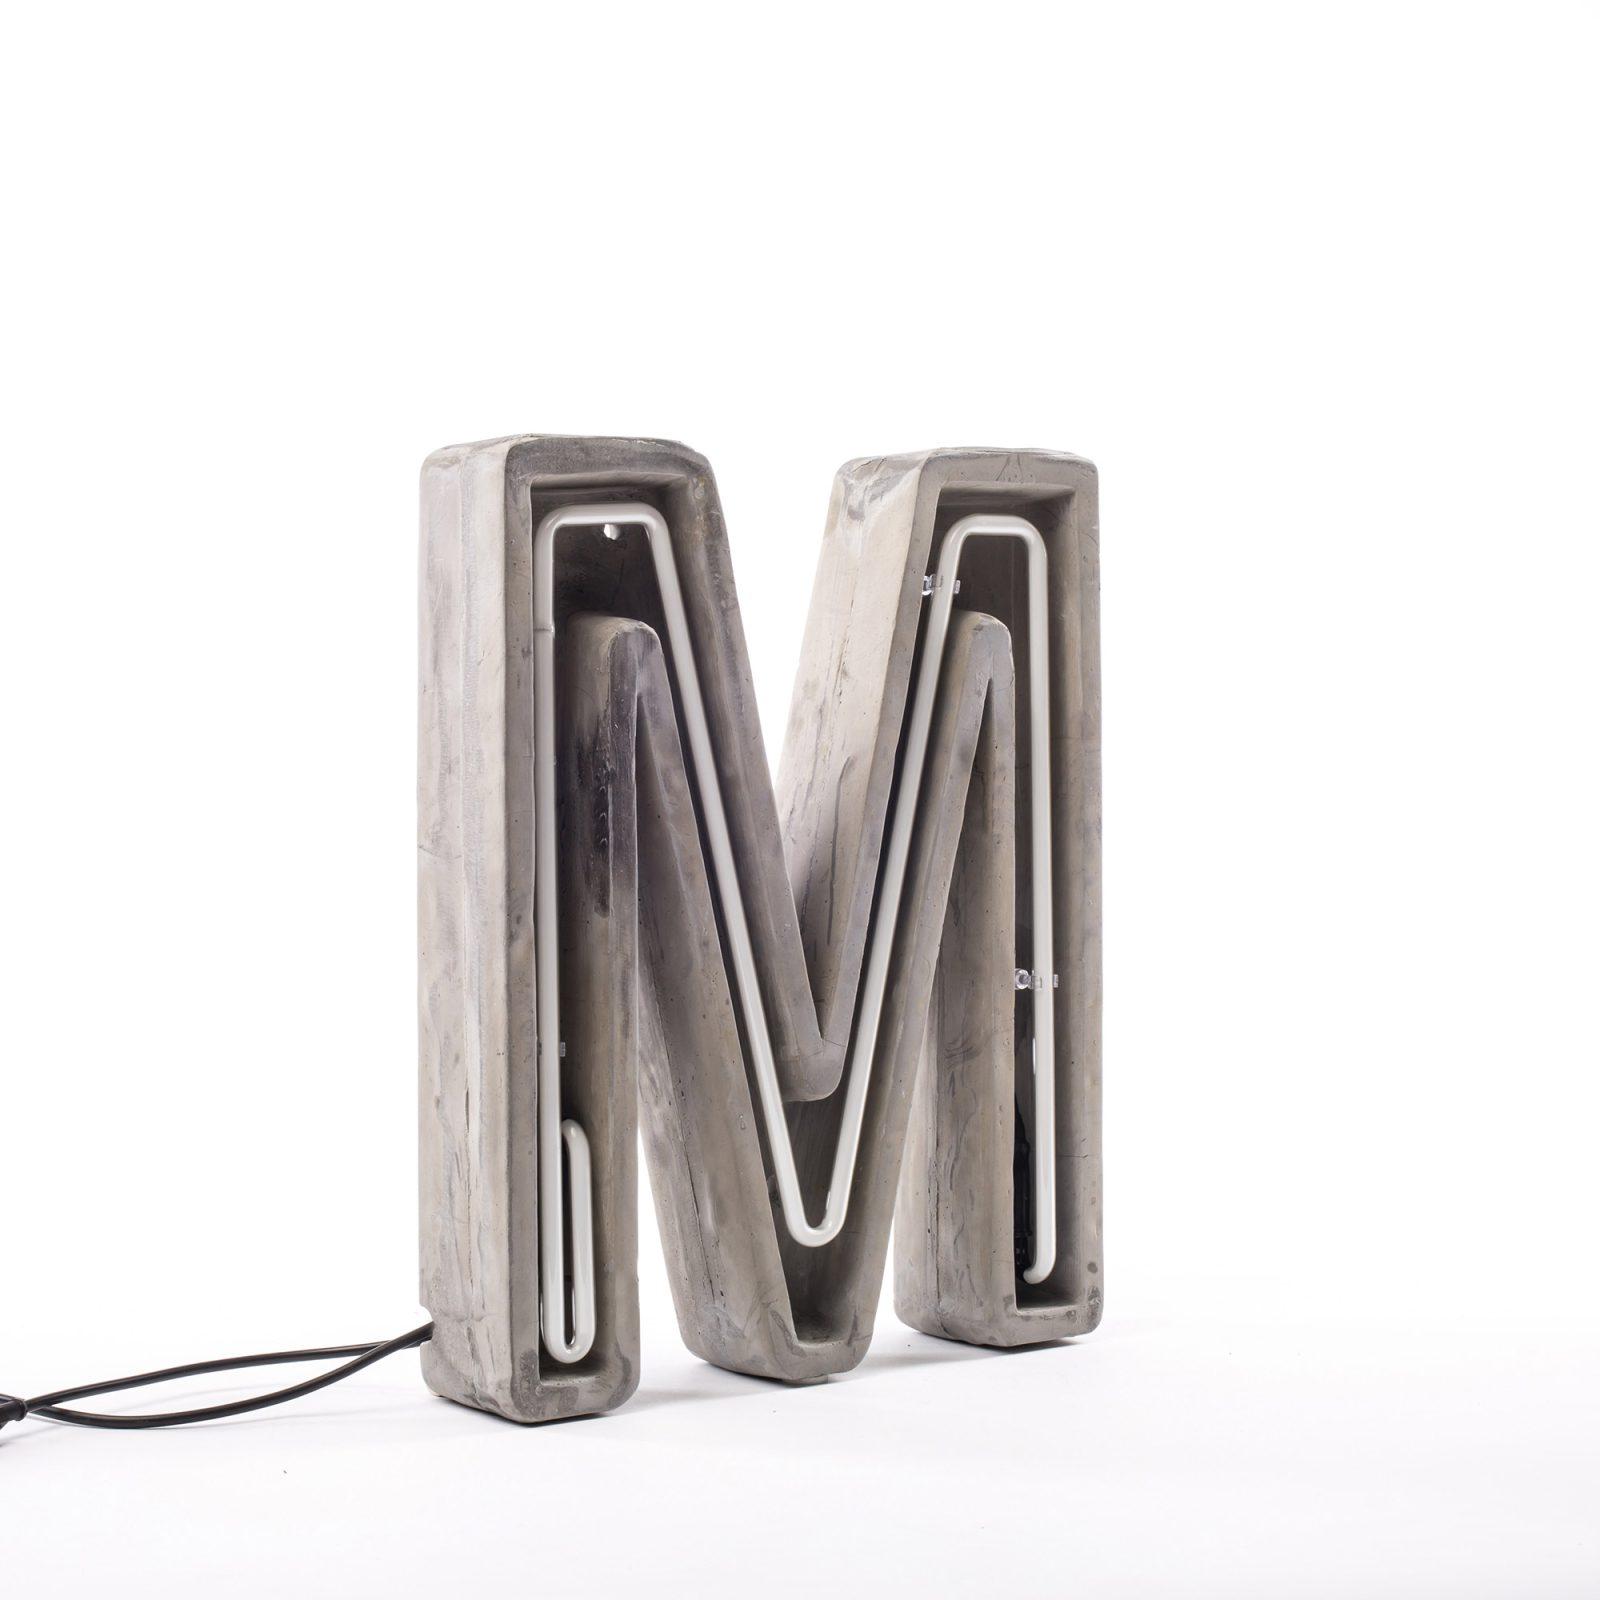 Alphacrete, Concrete Neon Light – M-32210